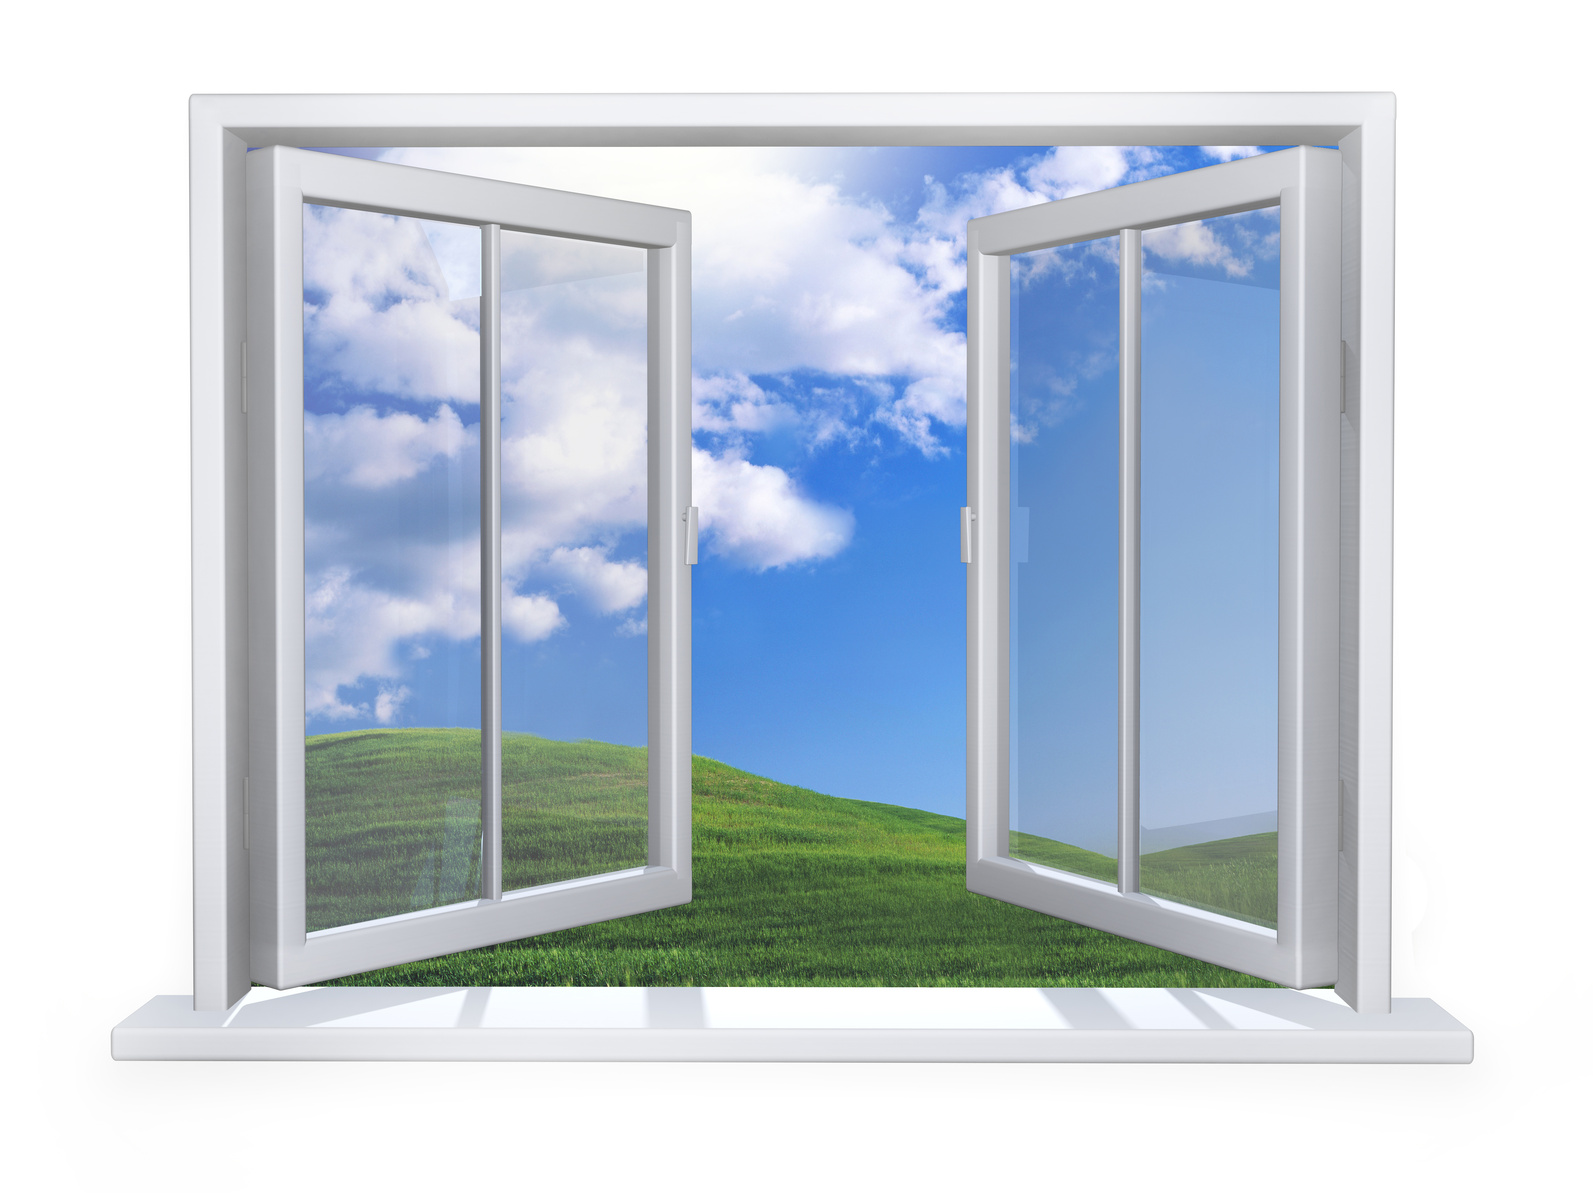 Pvc tamiri sineklik panjur tamiri du a kabin ed rne for Fenetre dos windows 7